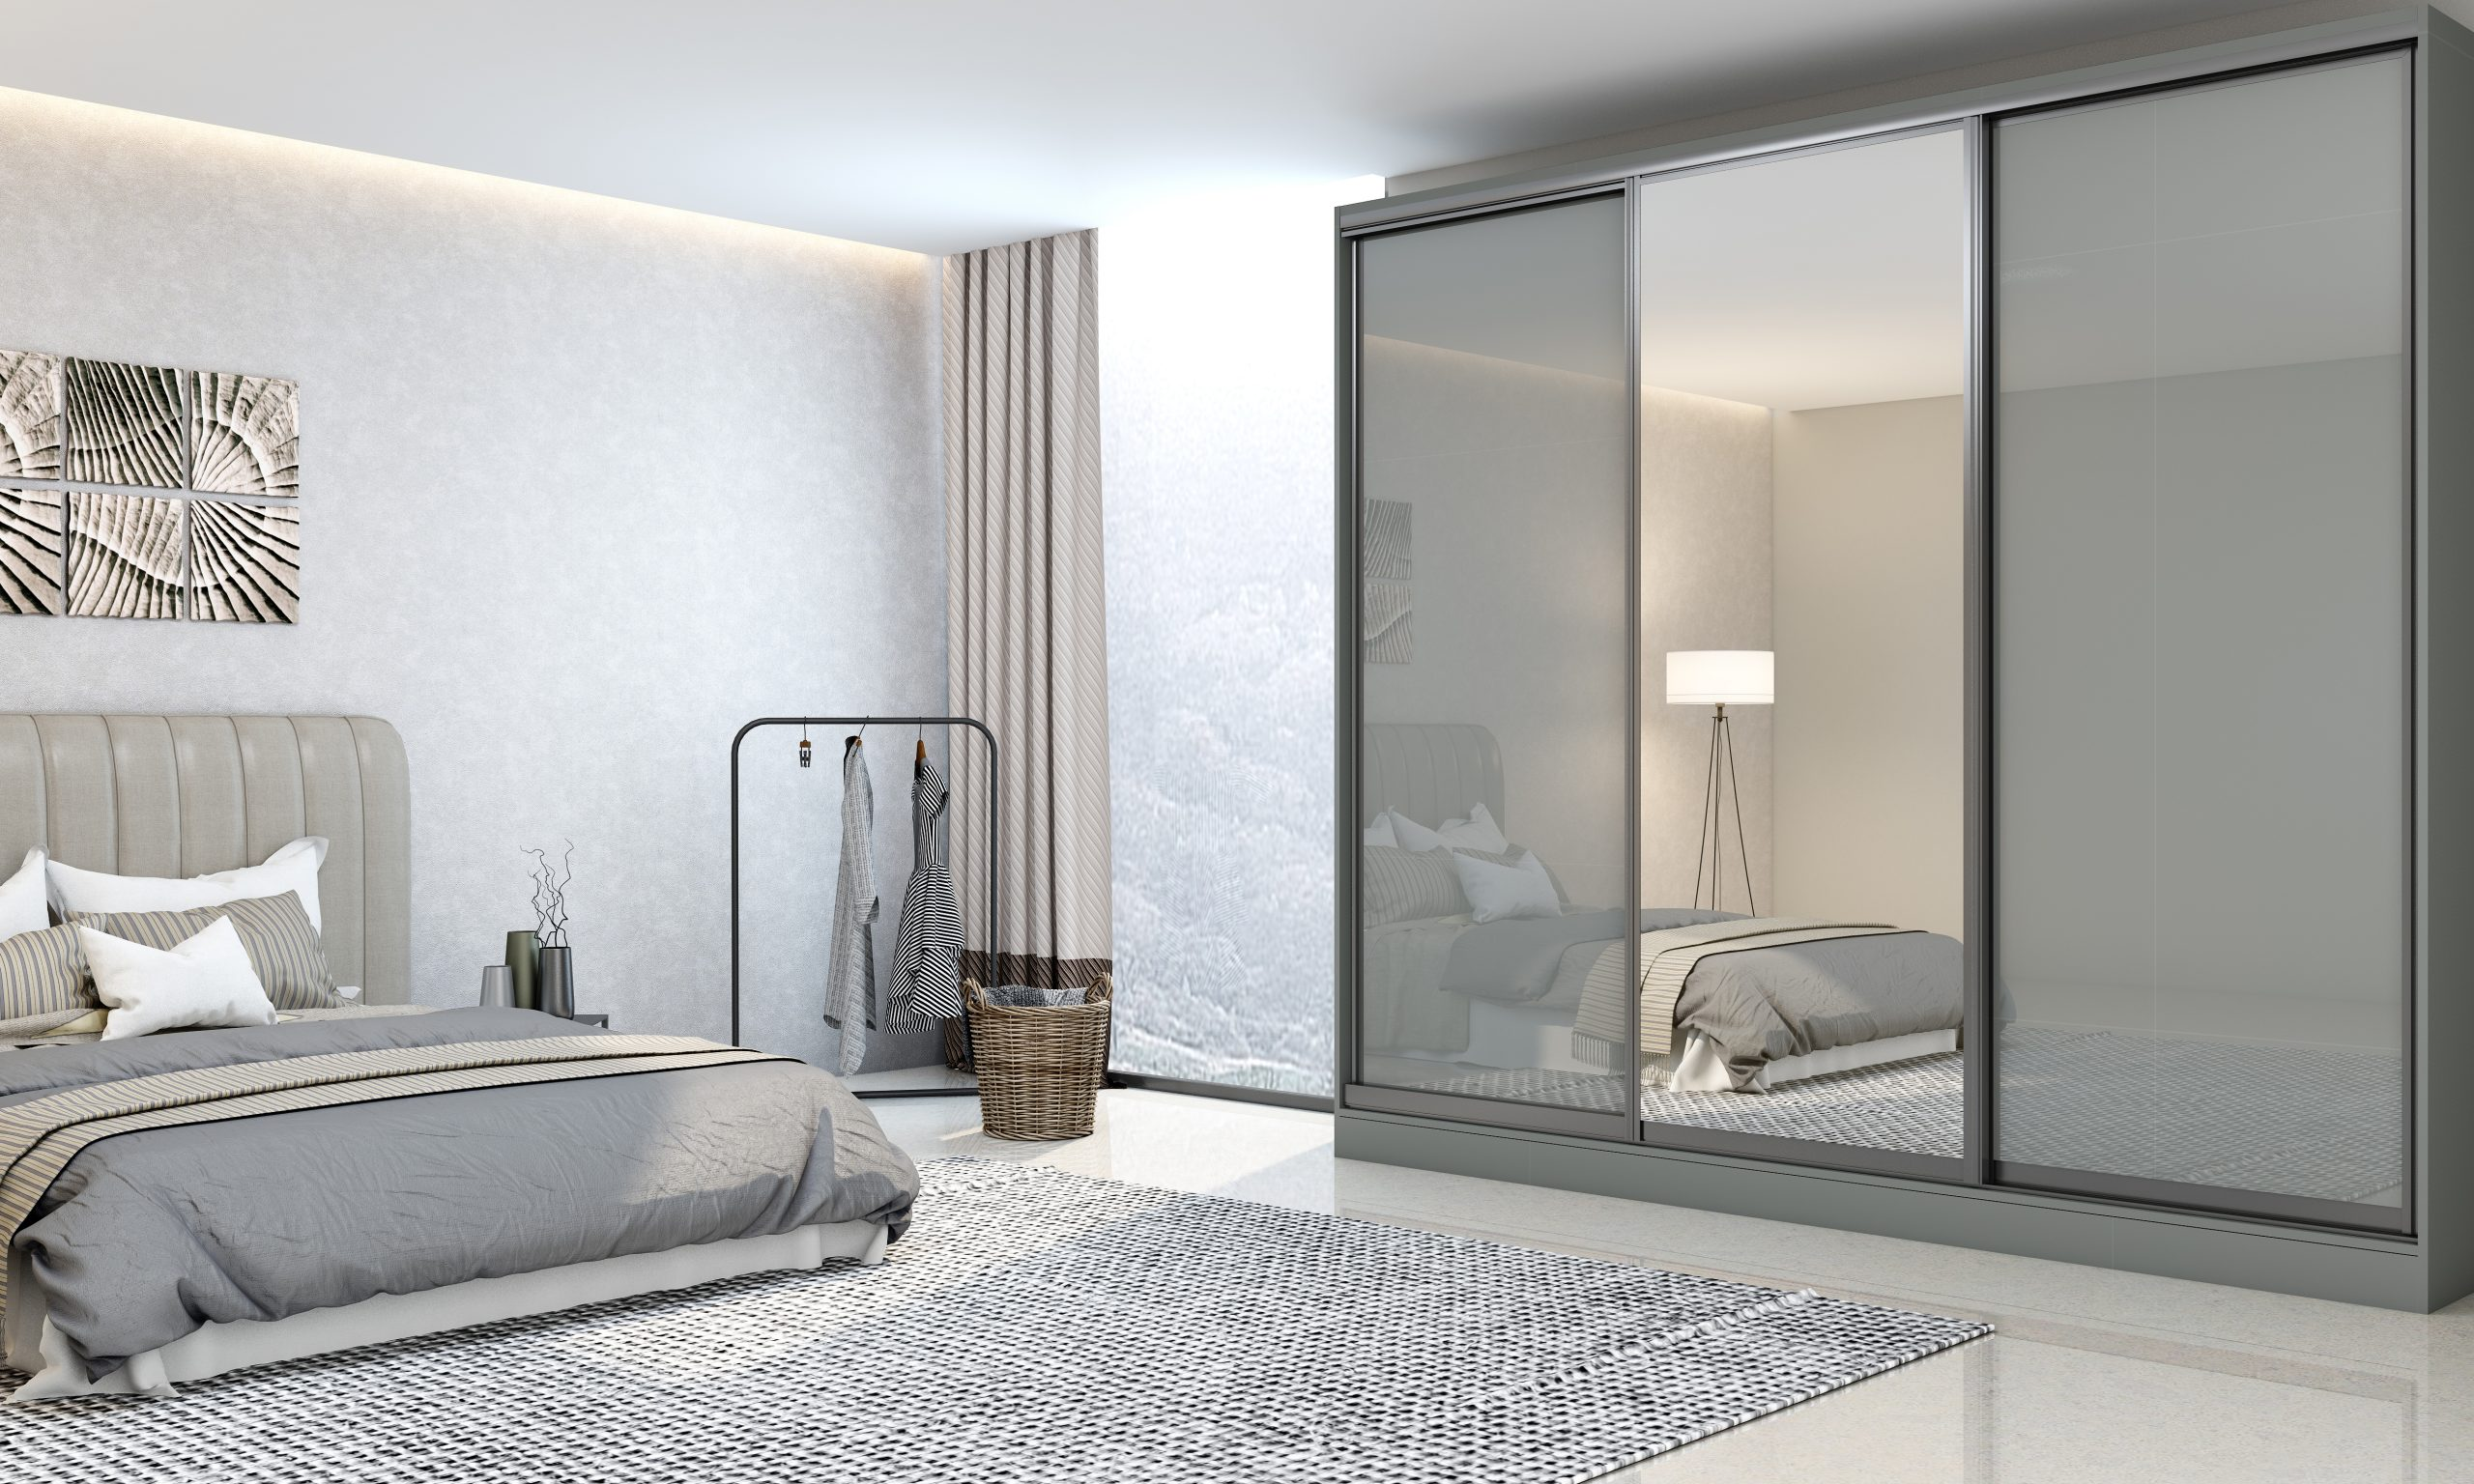 Bespoke wooden sliding wardrobe in dust grey gloss finish with full silver Mirror